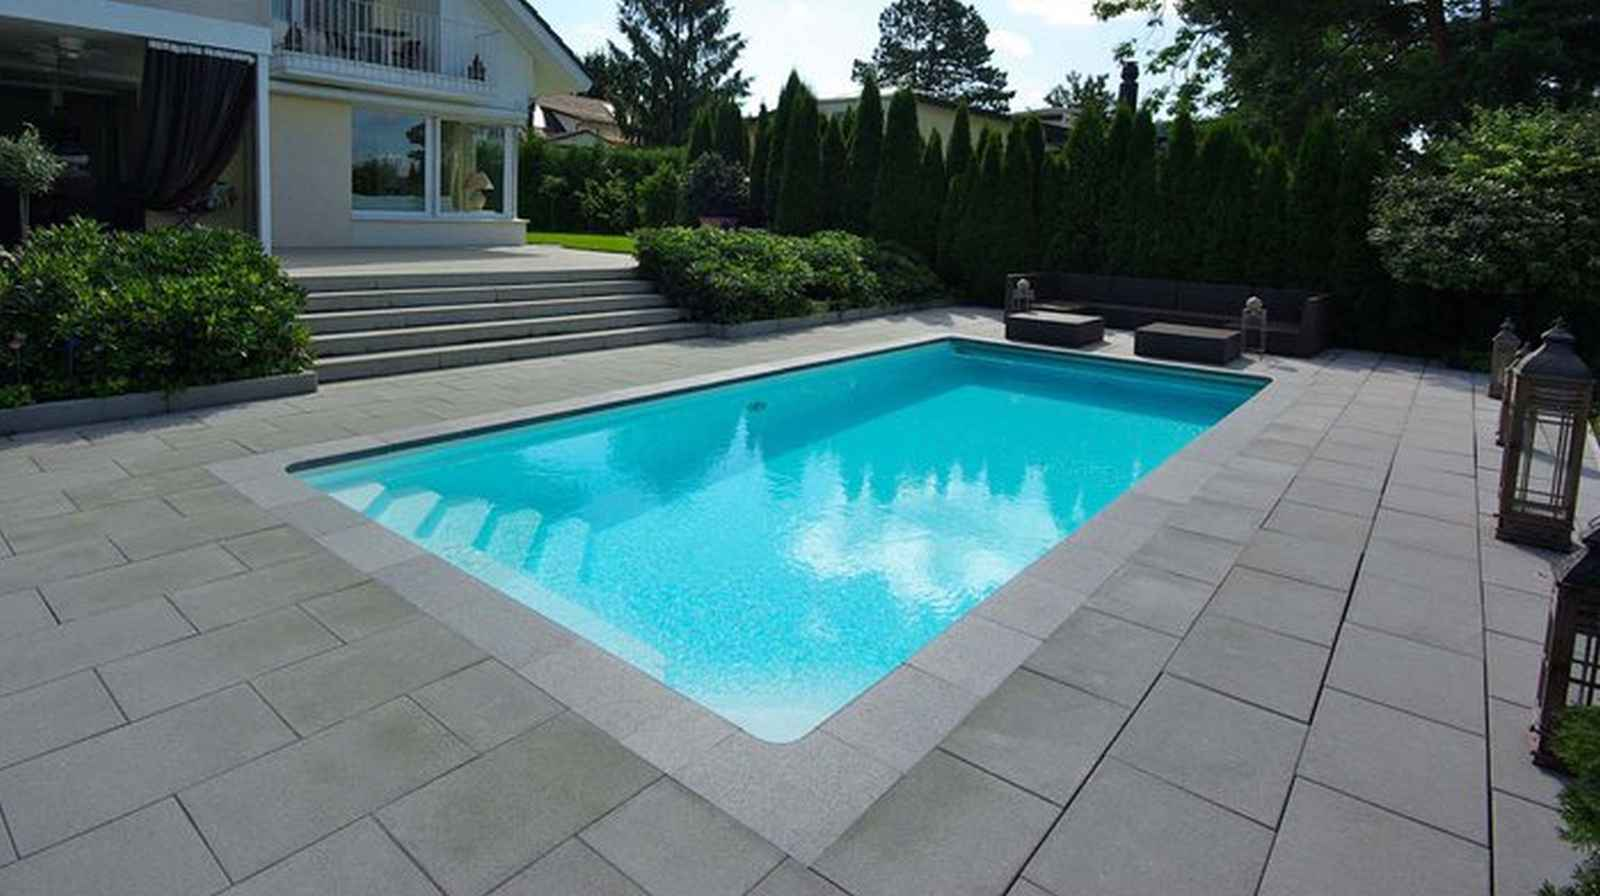 modell ischia 70 schwimmbadtechnik frankfurt. Black Bedroom Furniture Sets. Home Design Ideas